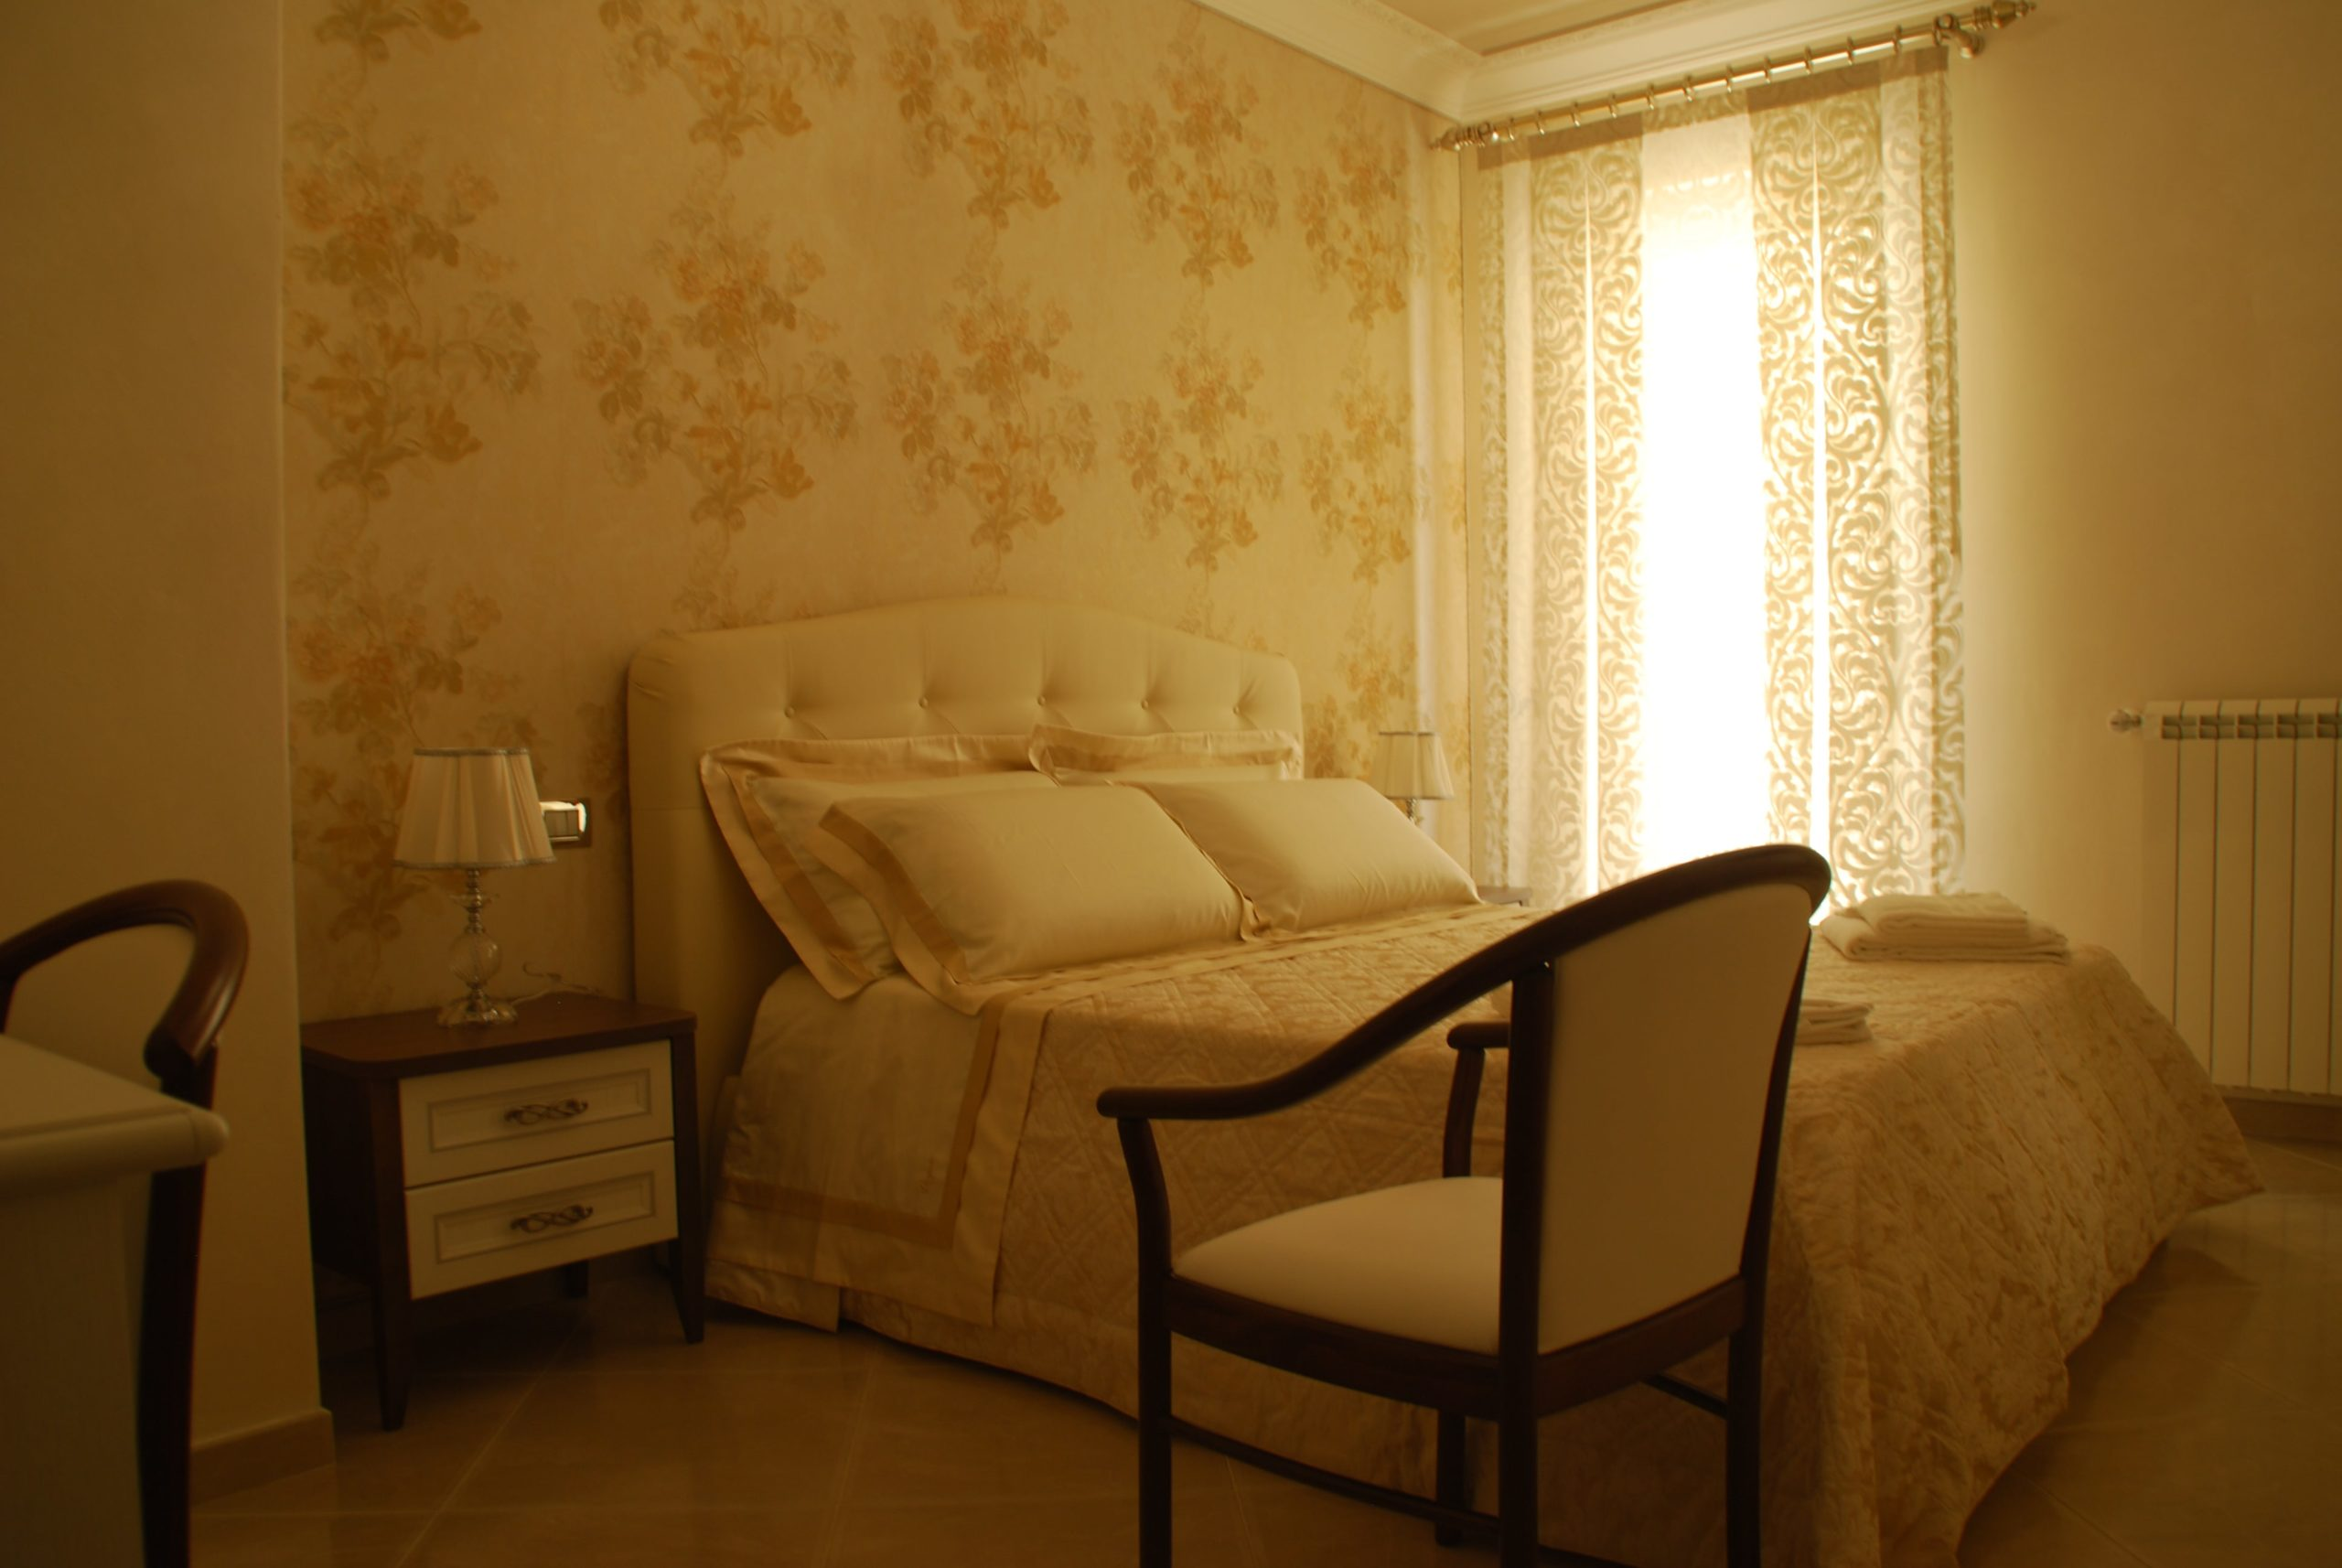 Danae - Deluxe Double Room With Balcony